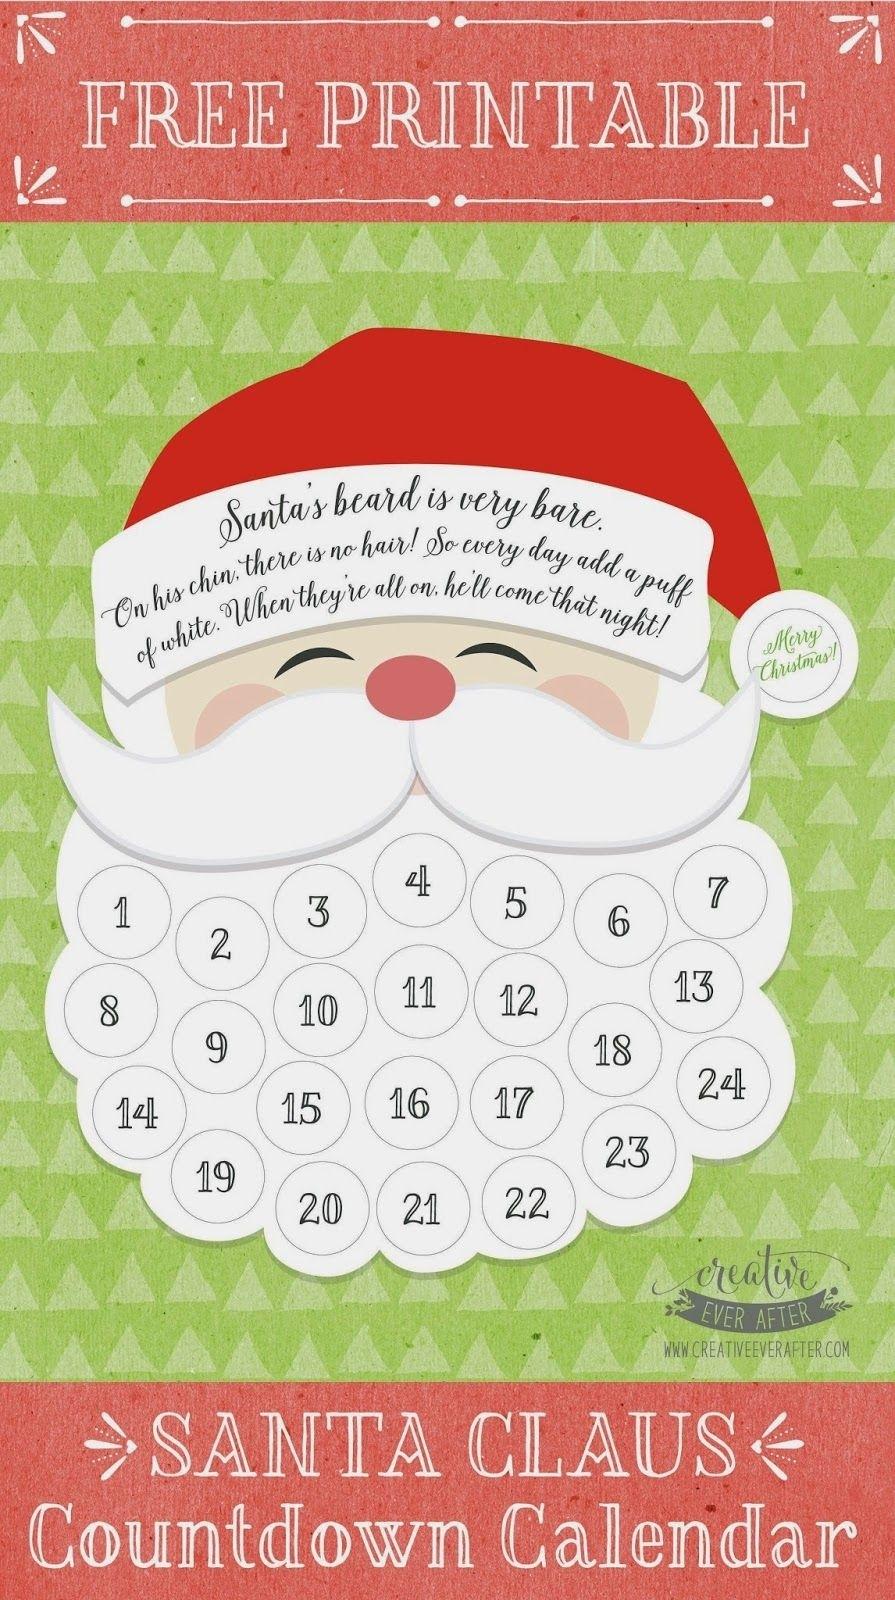 Free Printable} Santa Claus Beard Countdown Calendar | Printables Countdown Calendar To Christmas Printable